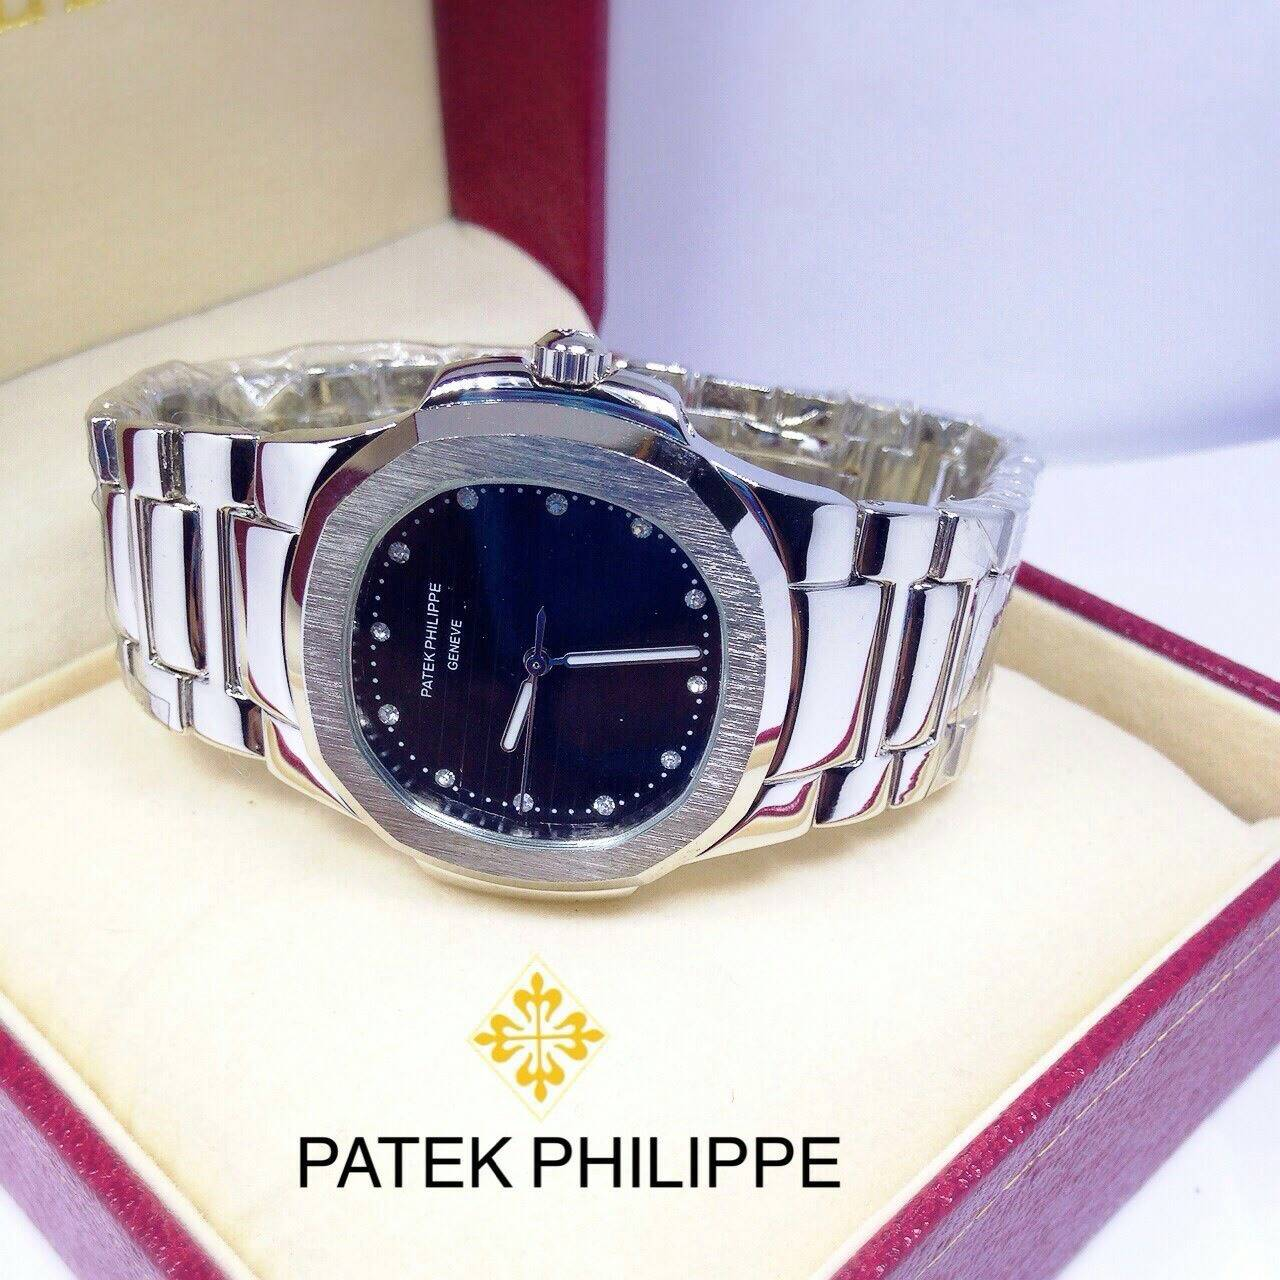 Patek phillipe นอติรุส เพชรจุด สีพิ้งค์ / สีเงิน / สีทองหน้าปัด 35 mm. ราคา 990 บาท